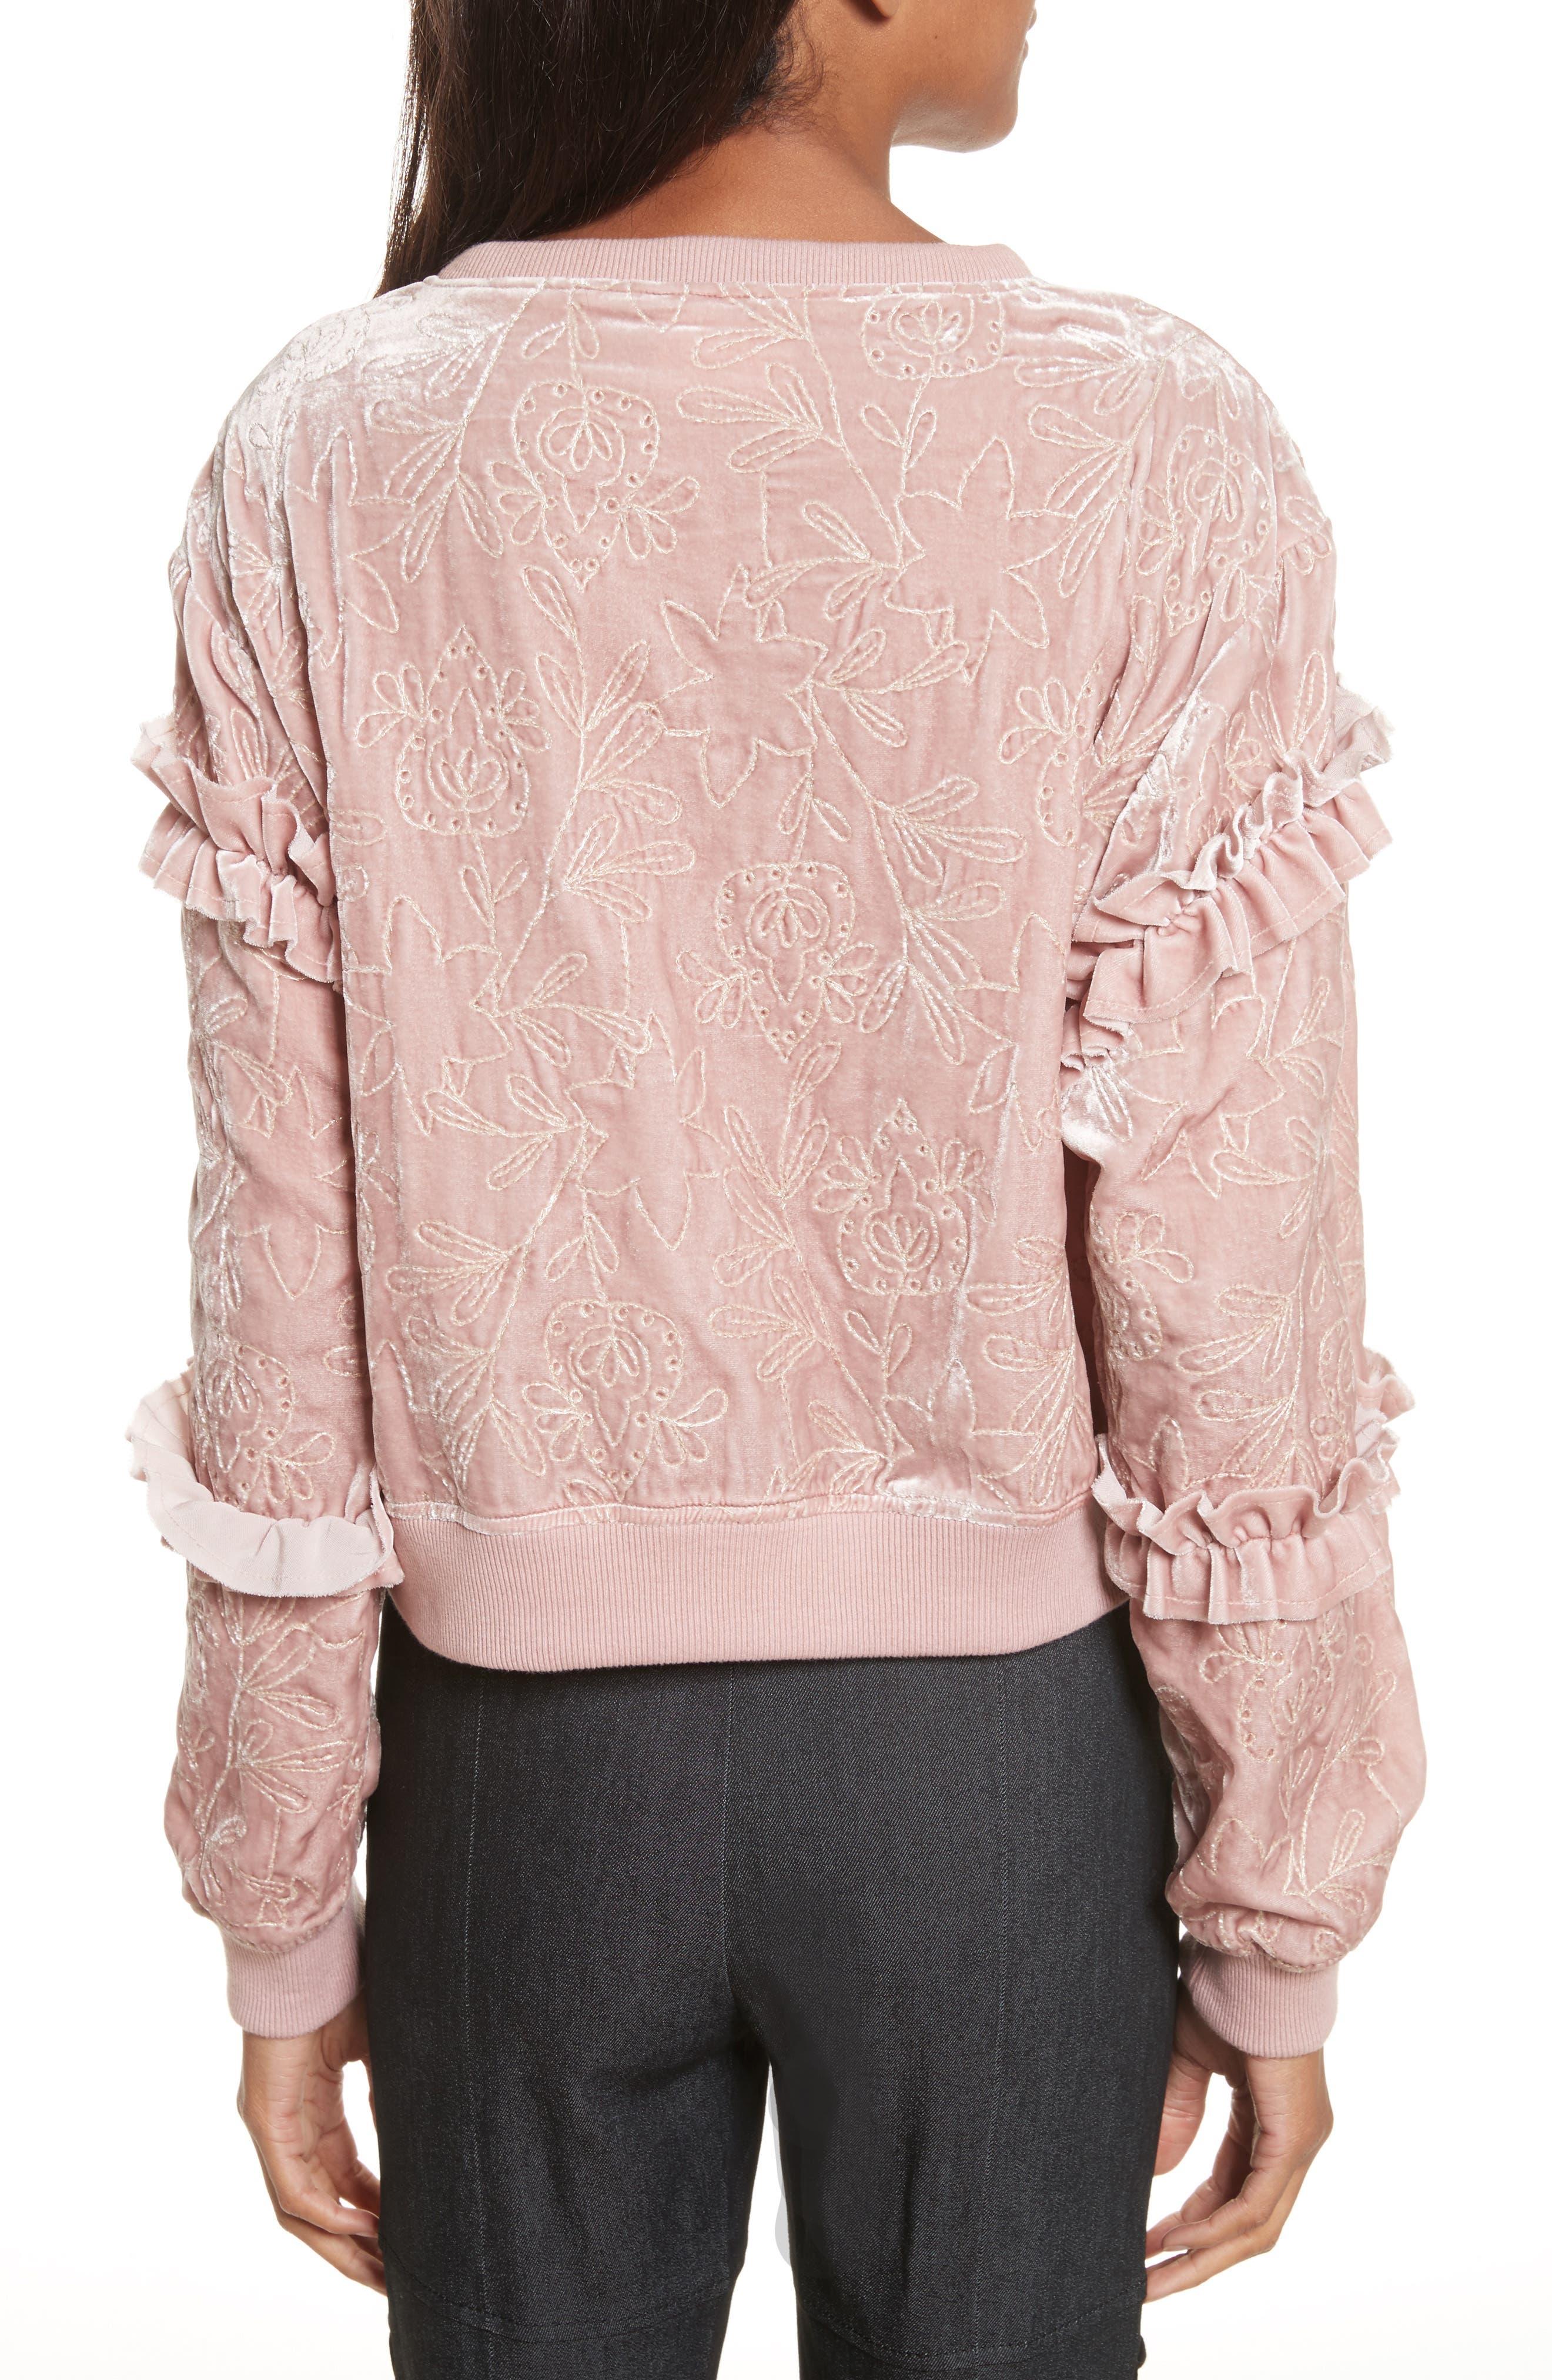 Nara Embroidered Velvet Sweatshirt,                             Alternate thumbnail 2, color,                             Mauve